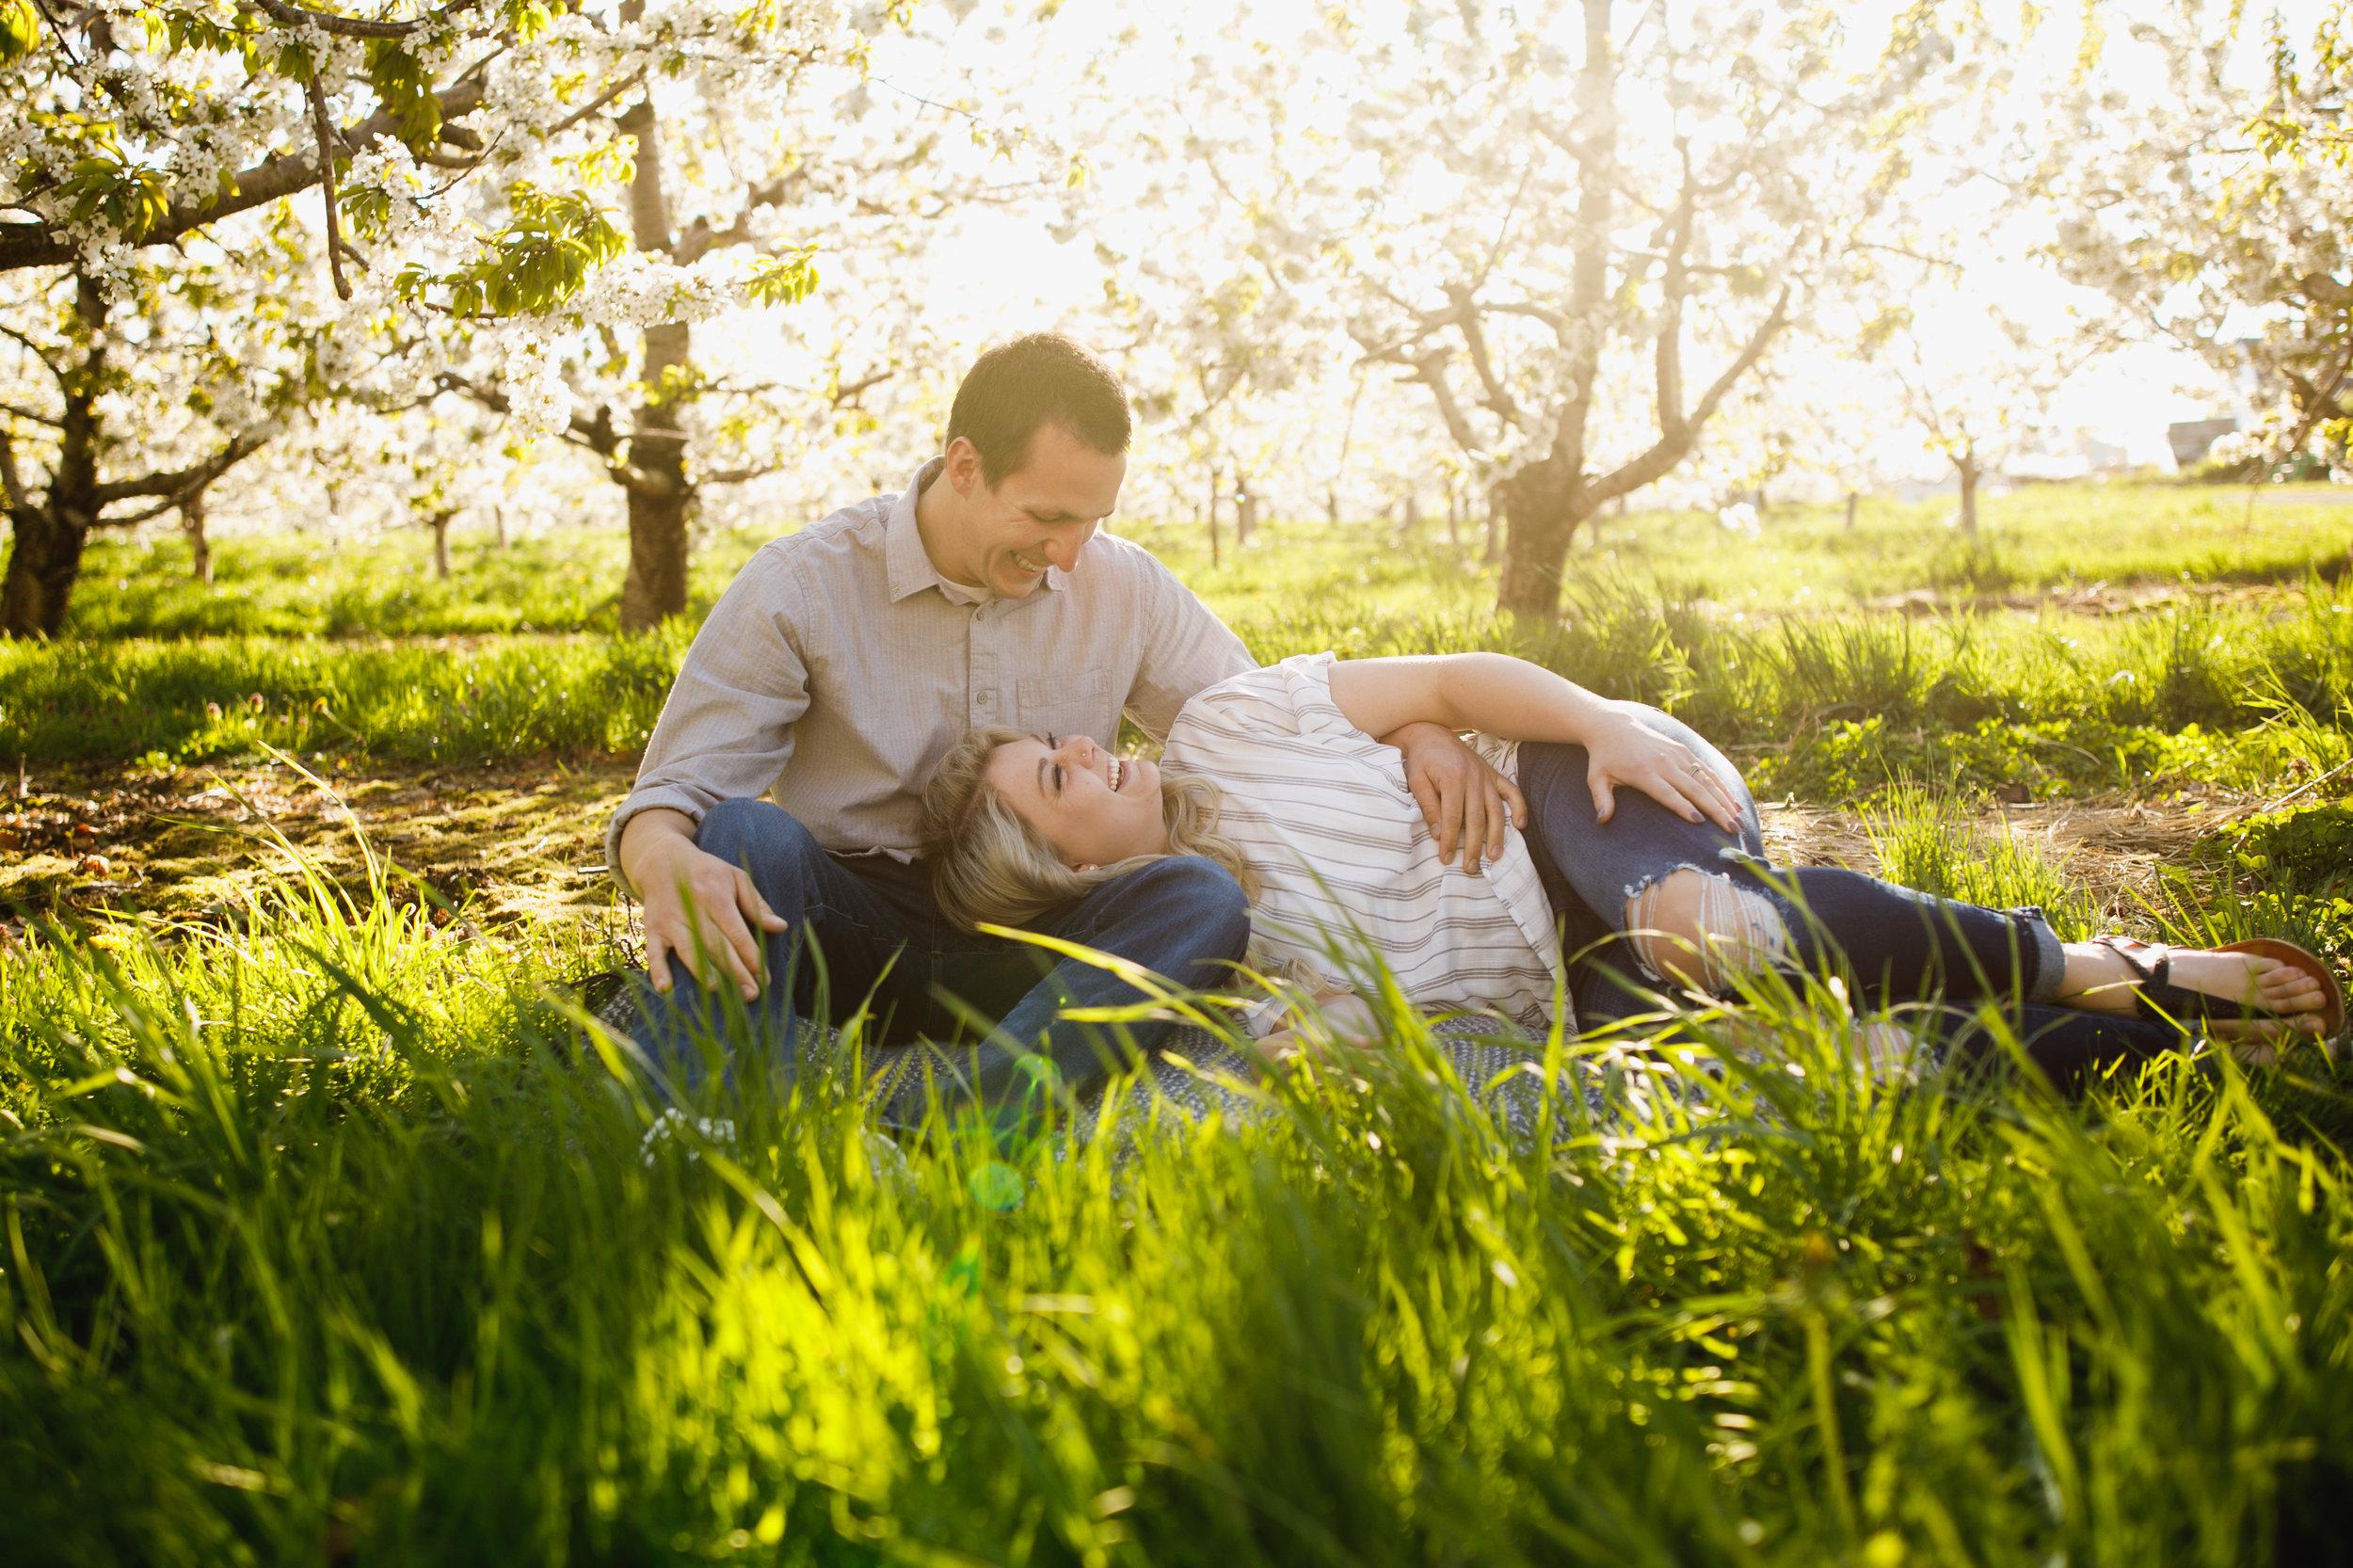 Grand Rapids Photographer - J Darling Photo - jessica darling - grand rapids wedding photographer - sparta airport - sparta michigan - jasmine and jeff engaged 003.jpg